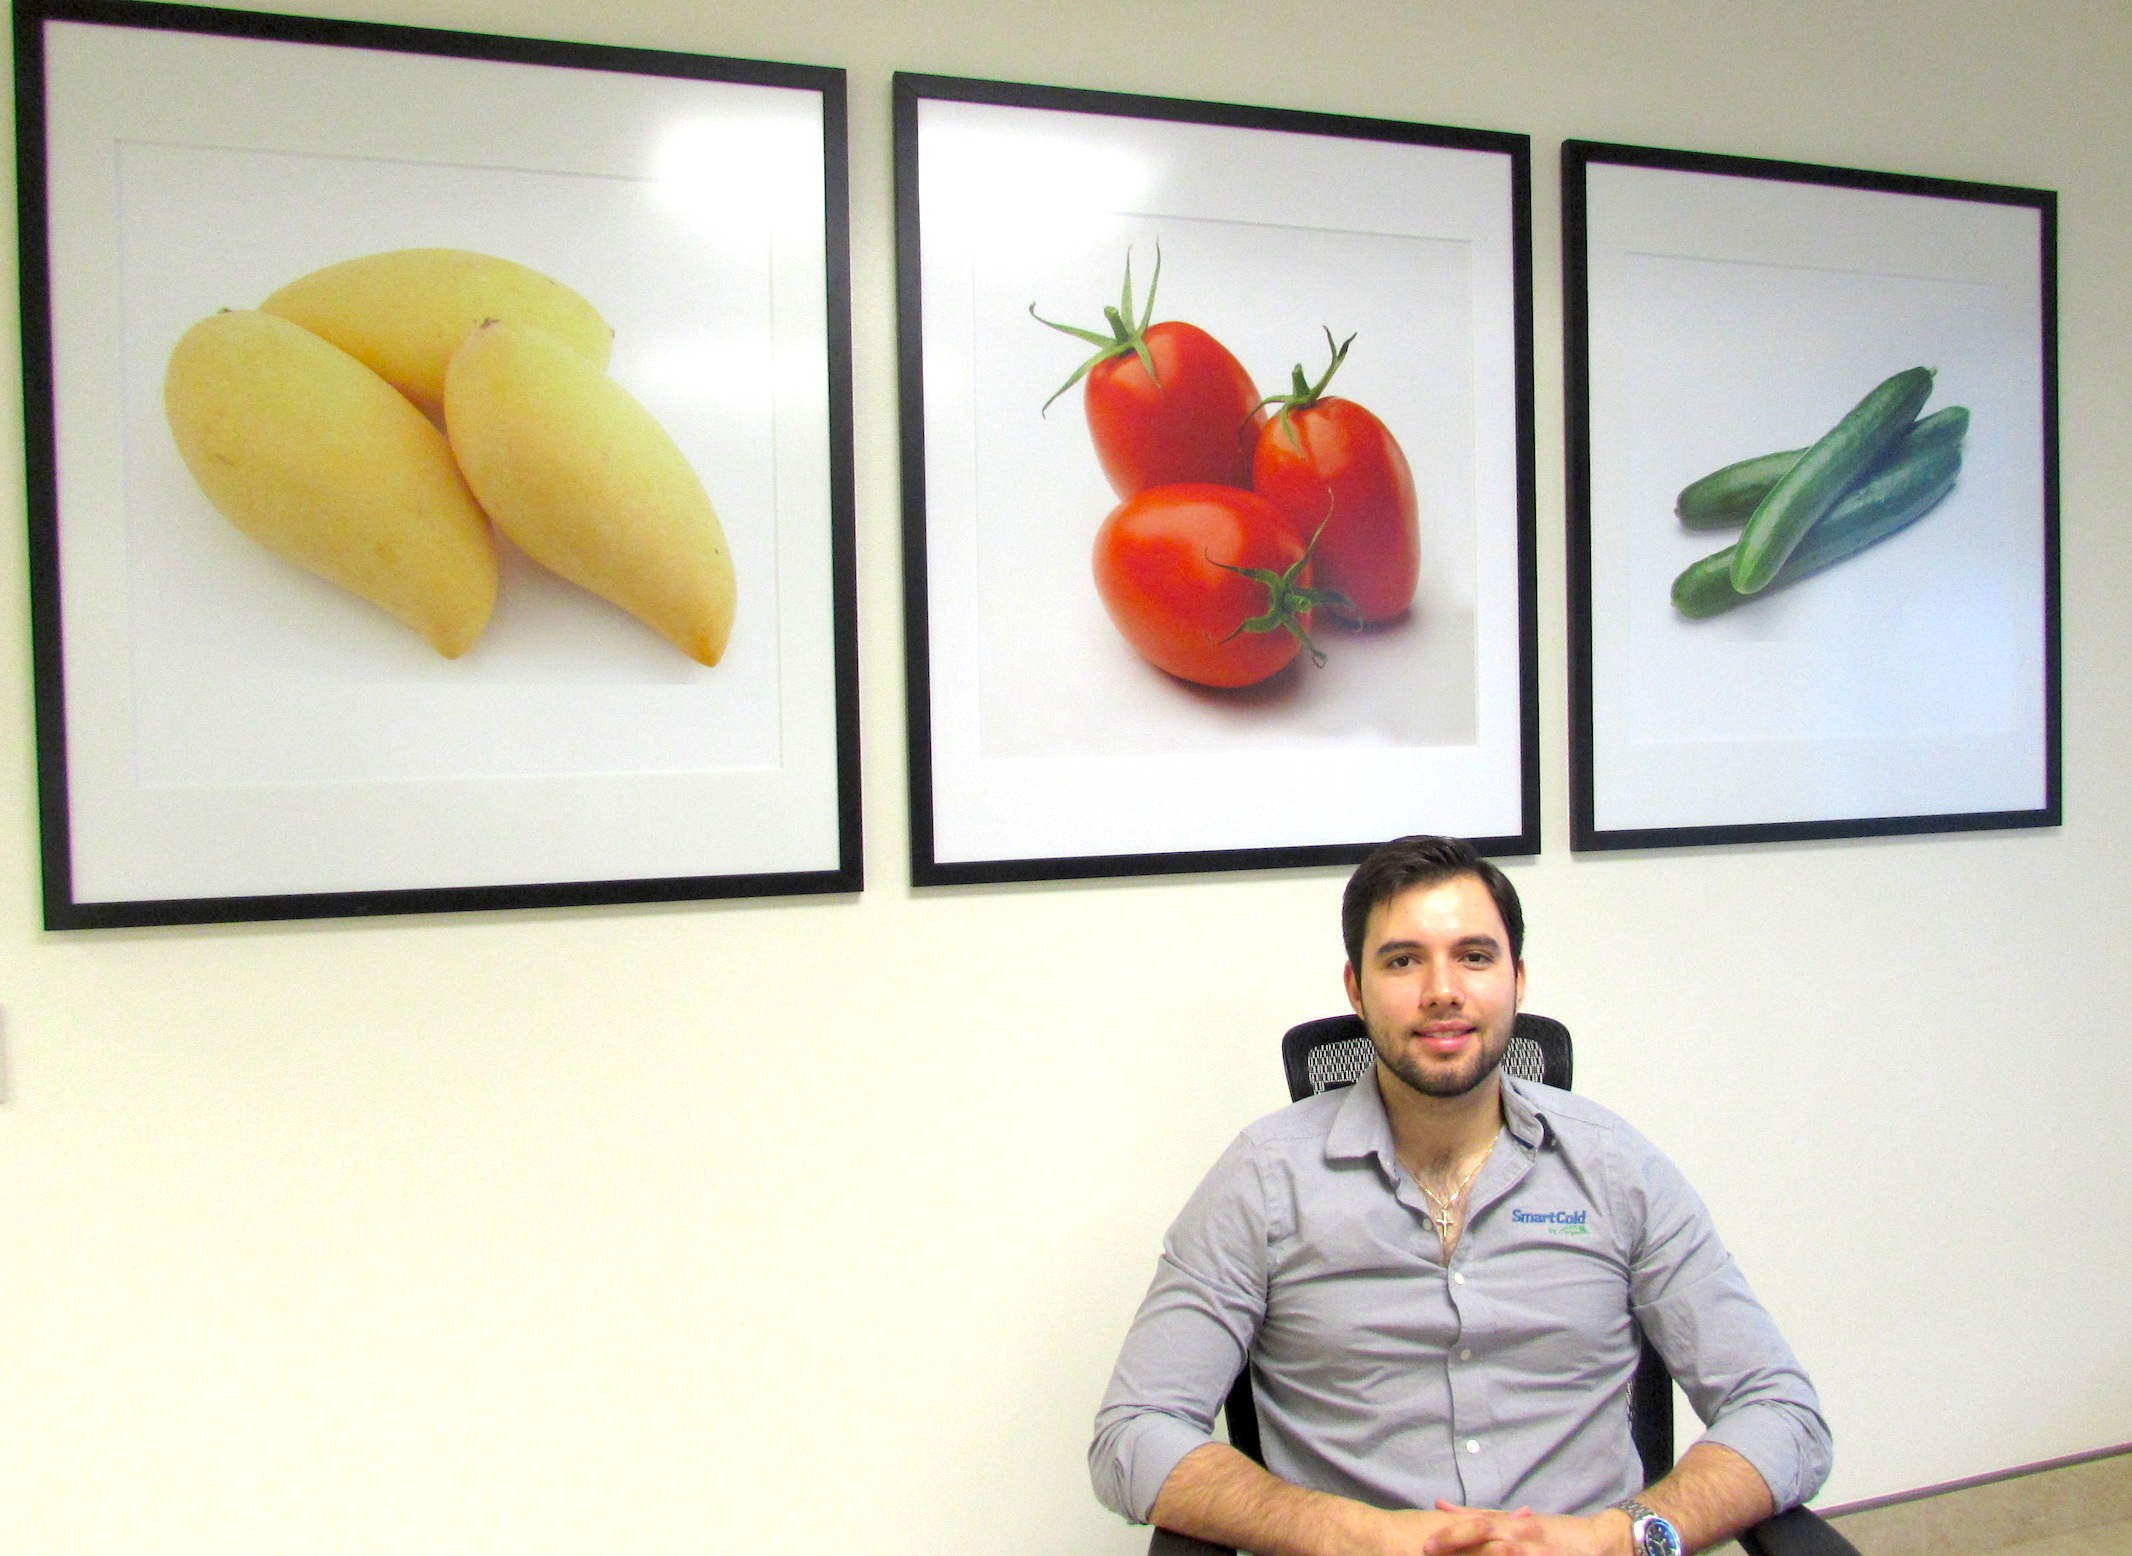 Pharr: The Produce Phenomenon - Valley Business Report